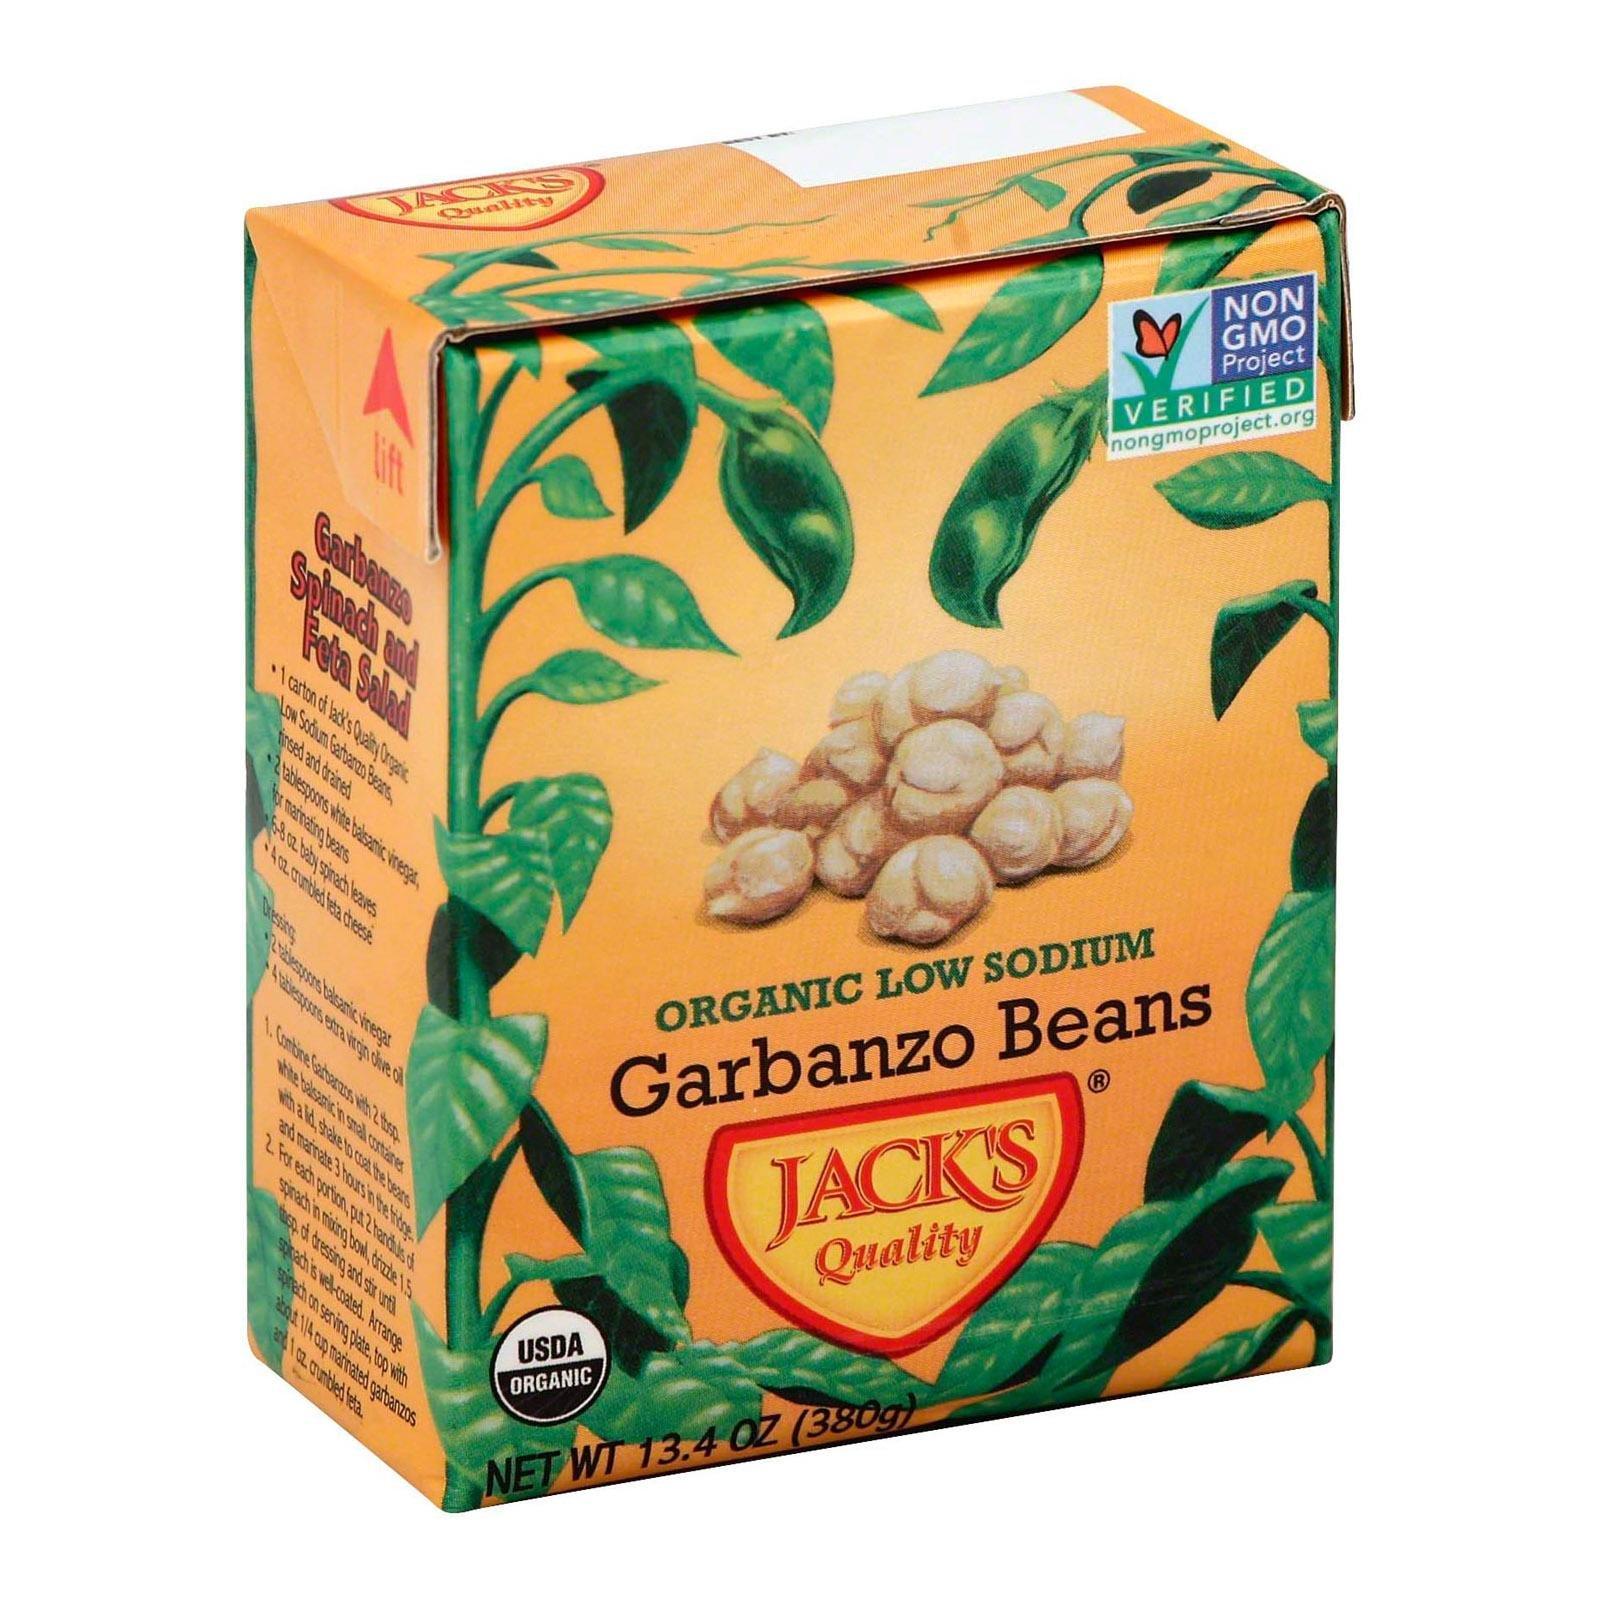 Jacks Quality Bean Grbnzo Lw Sodium Org